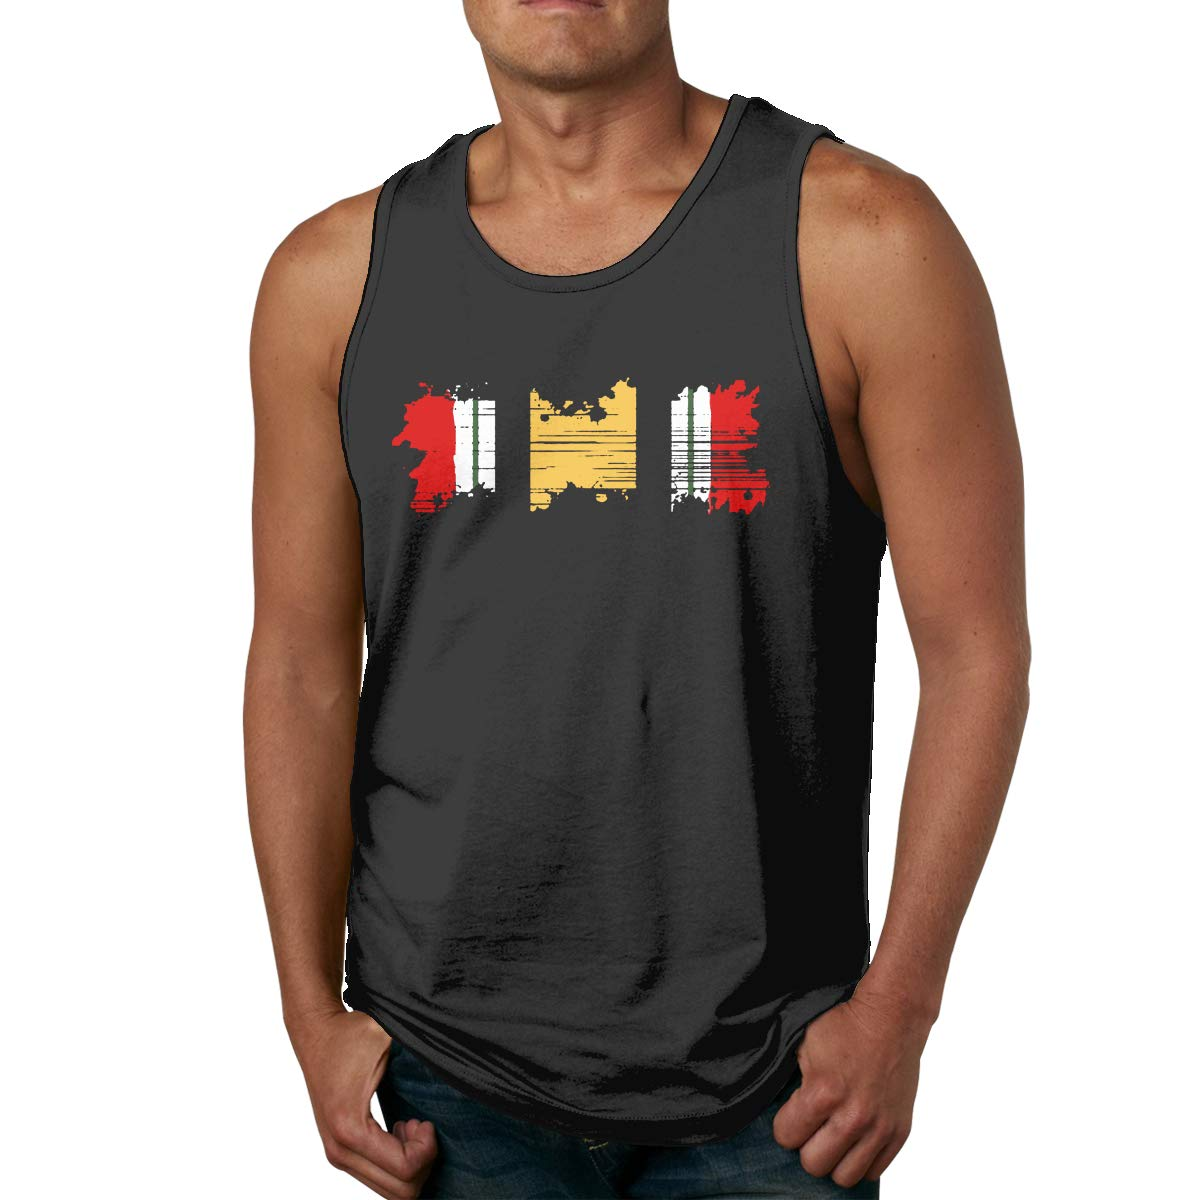 LLXM Iraq Campaign Medal Ribbon Veteran Mens Printed Vest Sports Tank-Top T Shirt Leisure Shirt Sleeveless Shirts